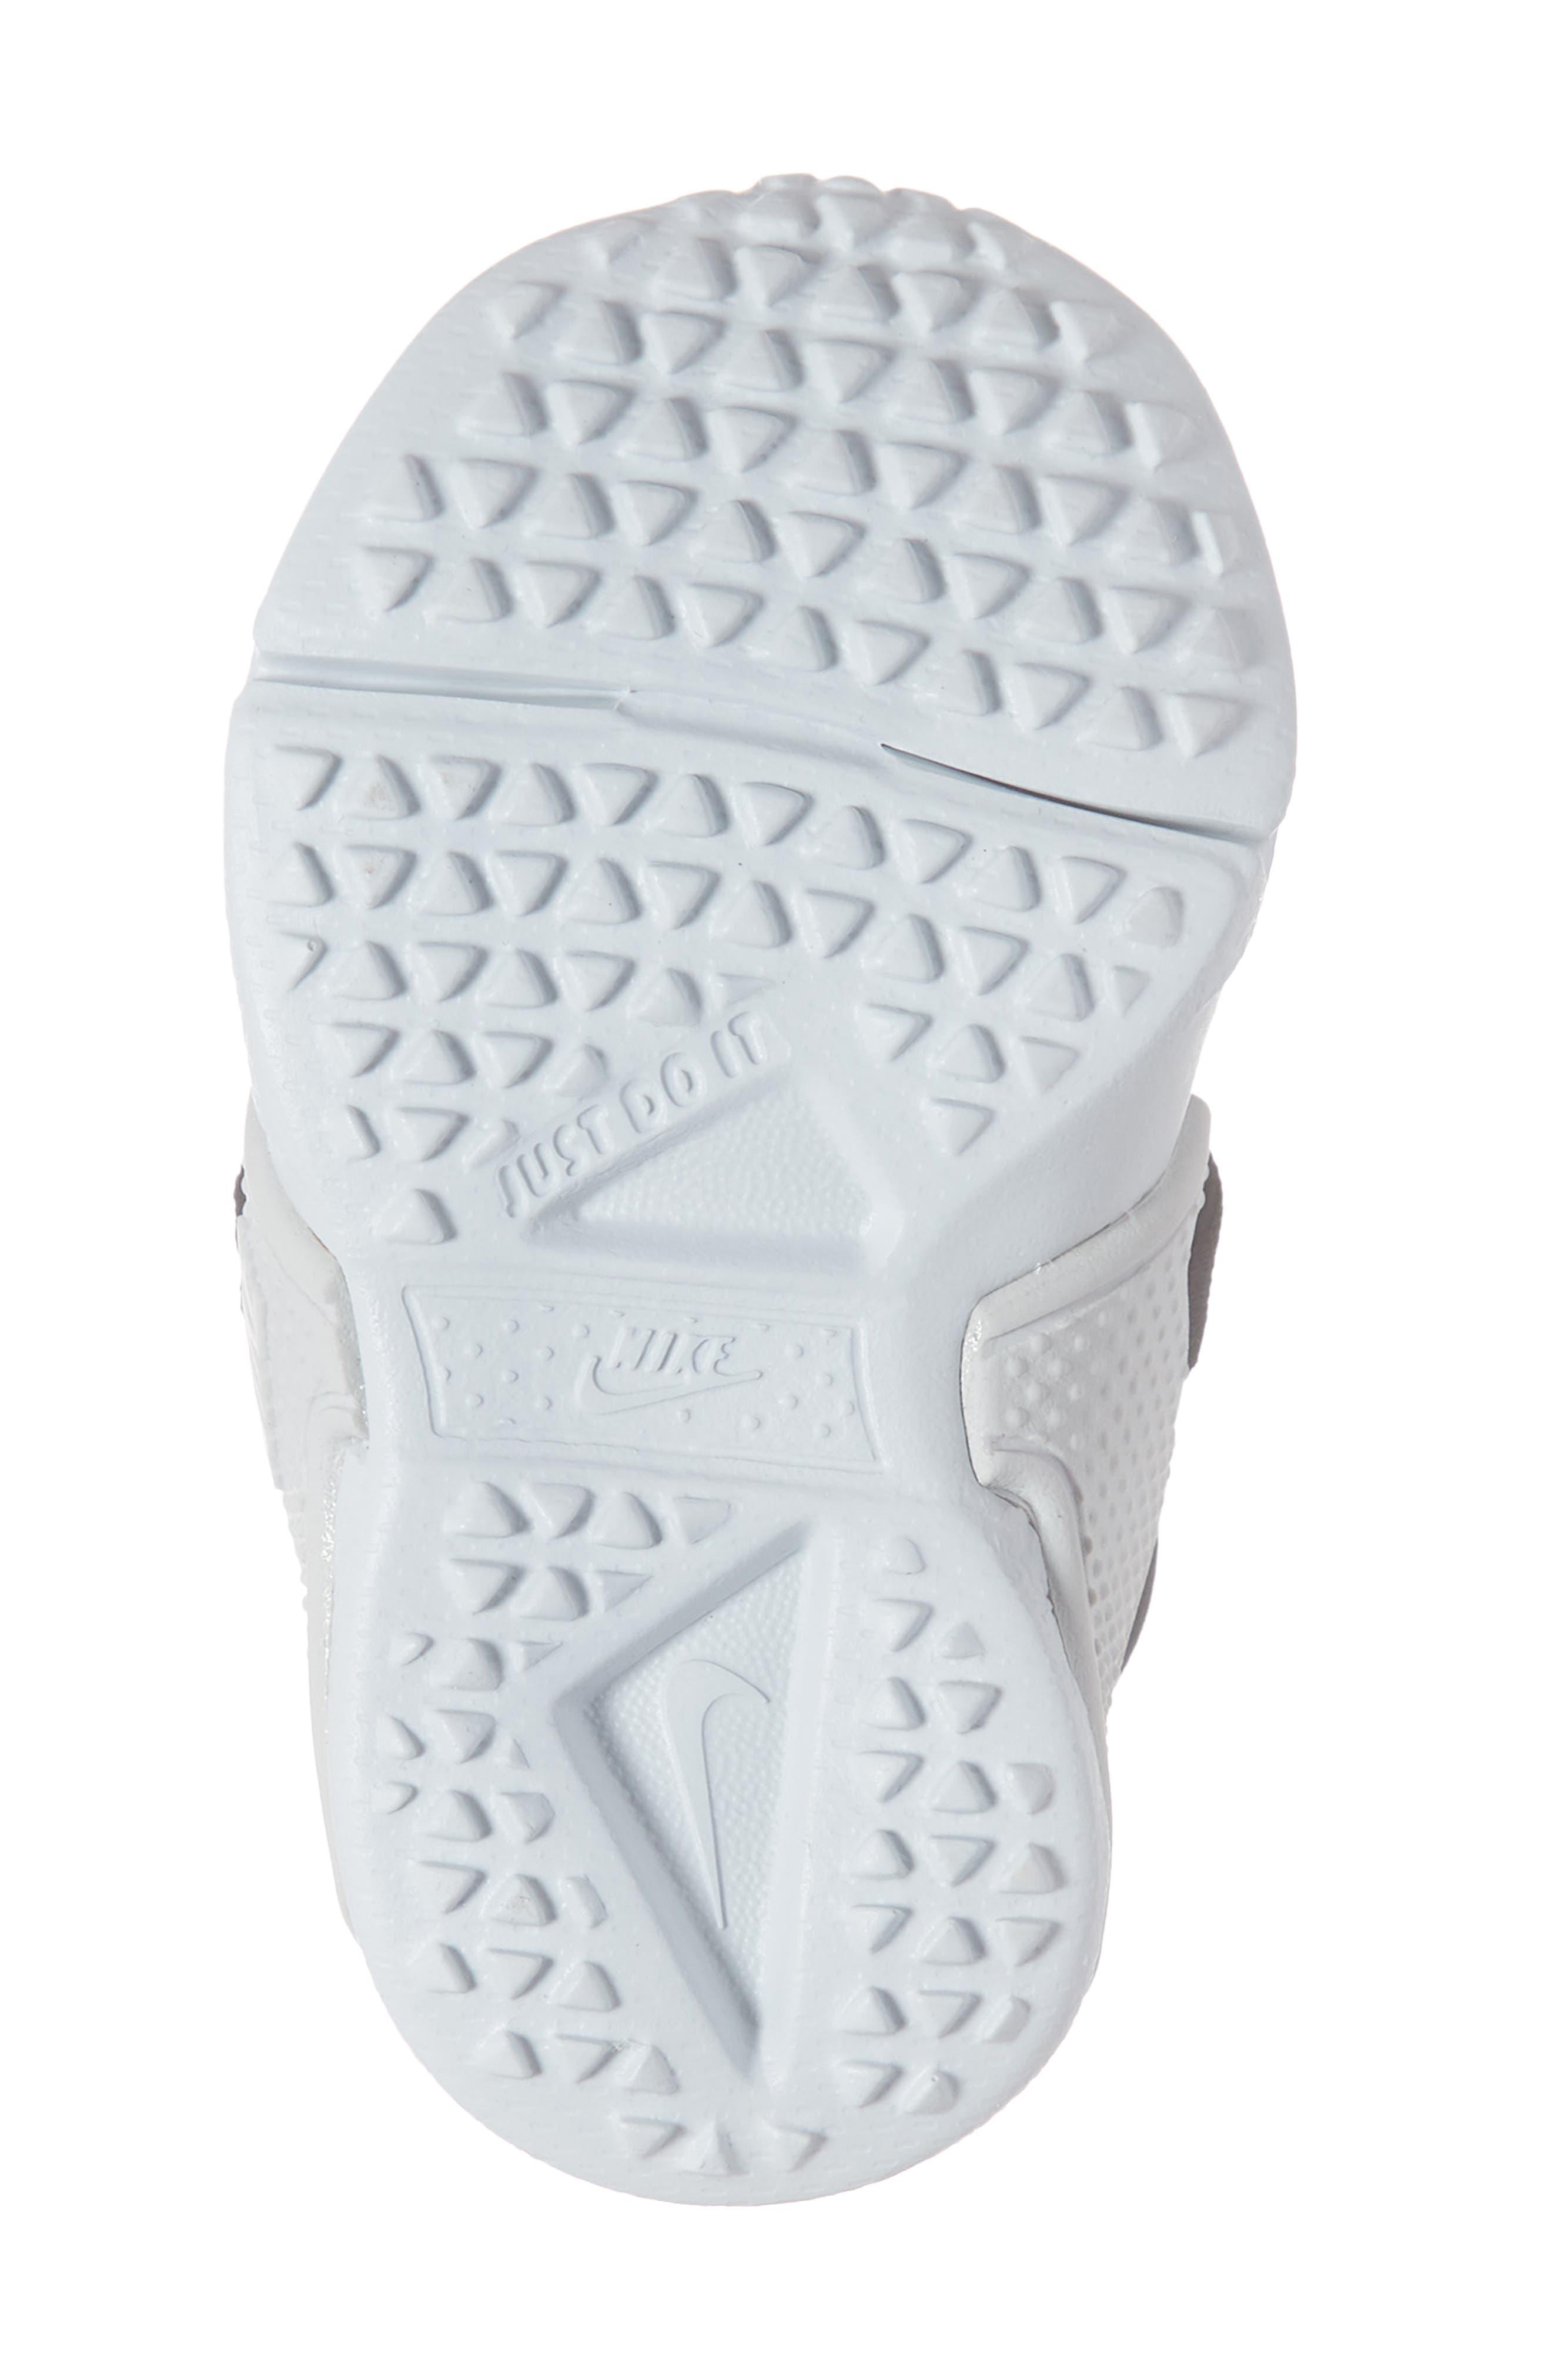 NIKE, Huarache Extreme Sneaker, Alternate thumbnail 6, color, BLACK/ METALLIC SILVER-GREY